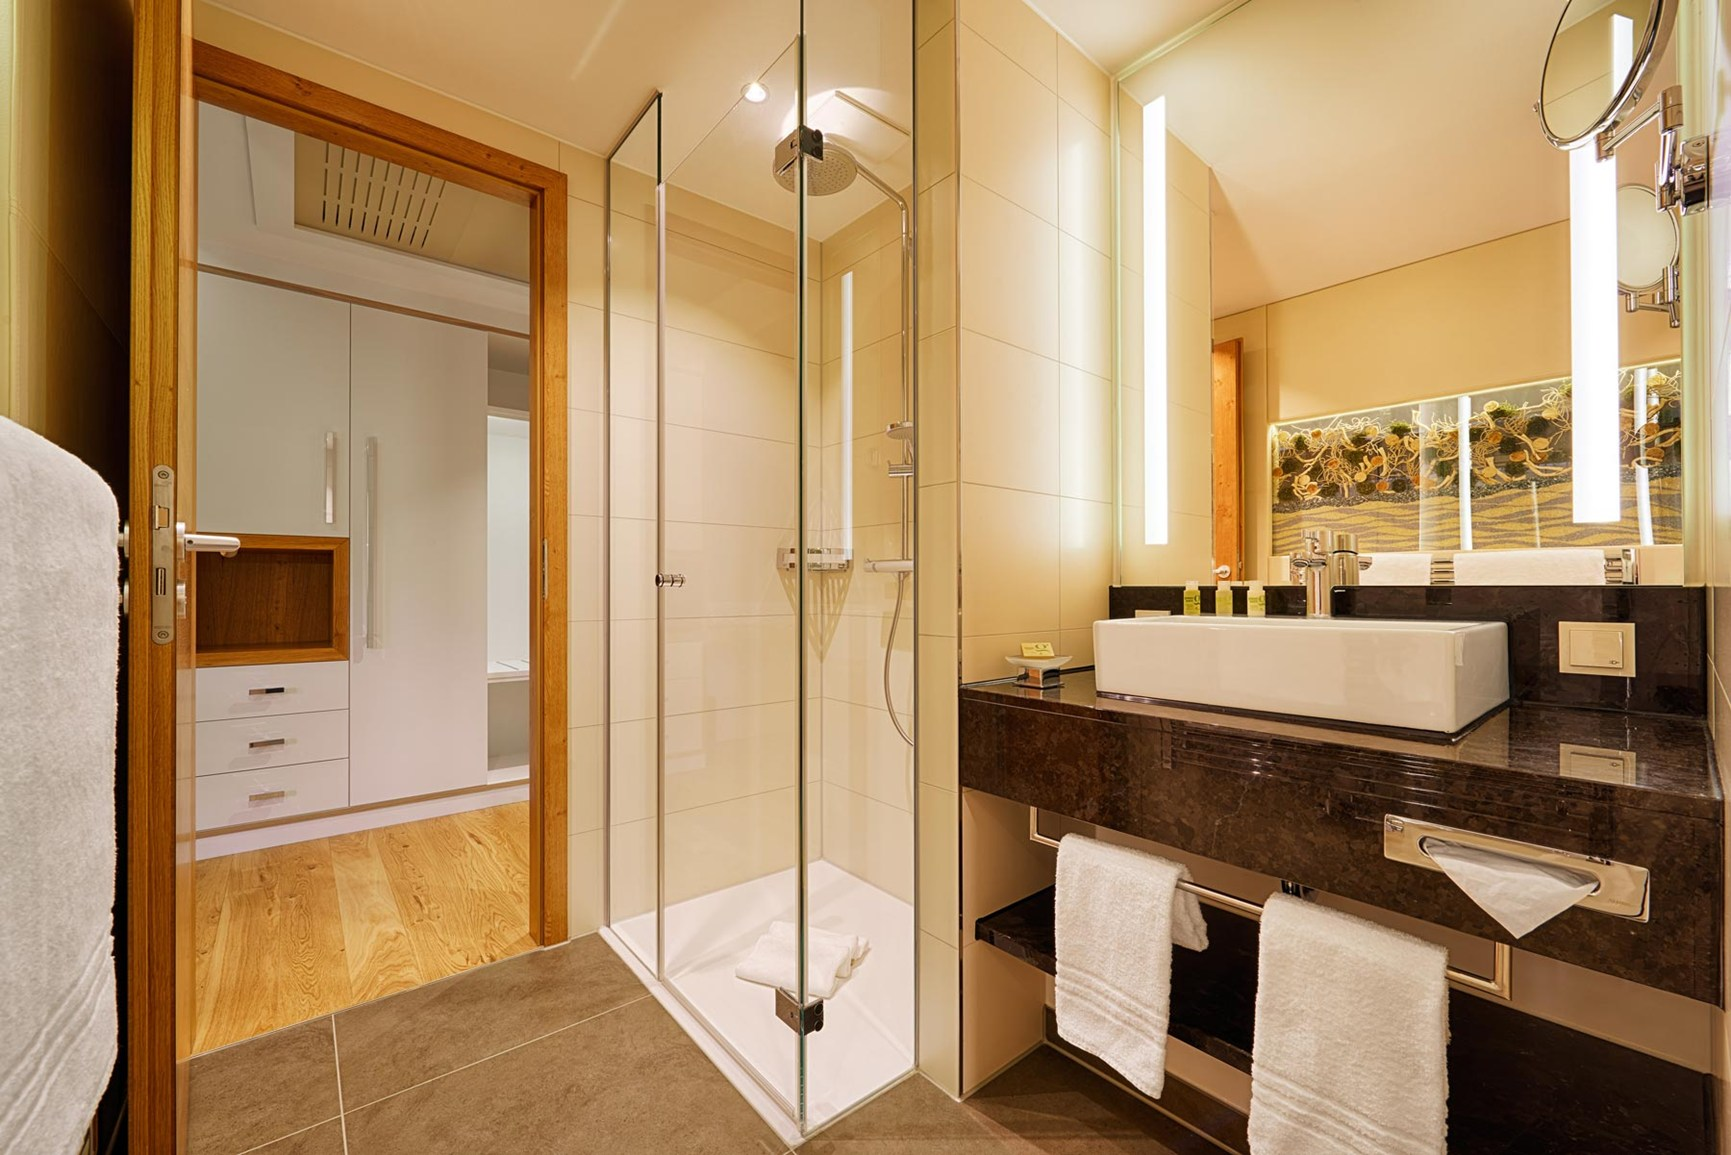 kaldewei per l hotel spa kaisergarten. Black Bedroom Furniture Sets. Home Design Ideas